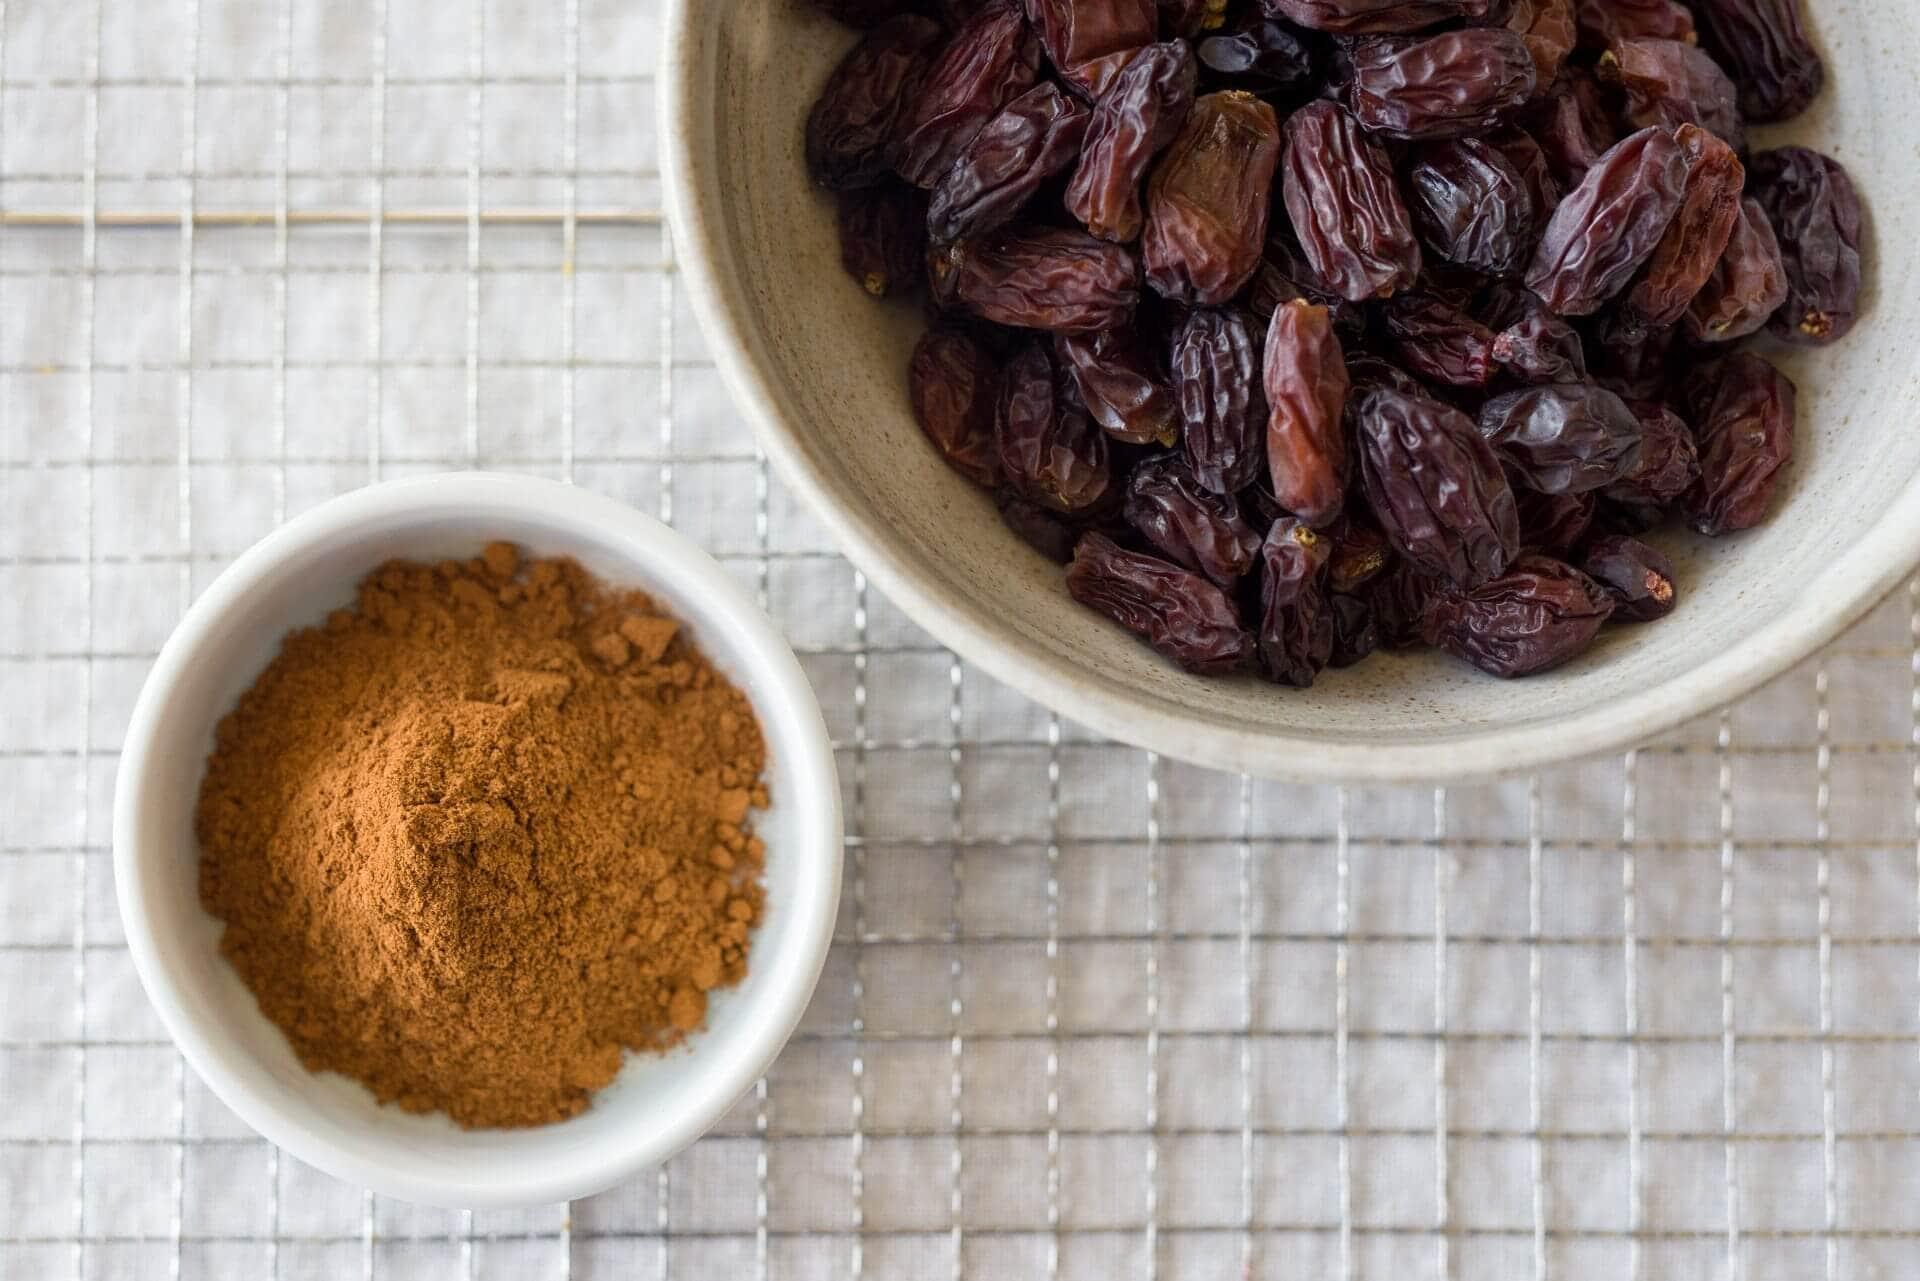 Cinnamon Raisin Sourdough via @theperfectloaf